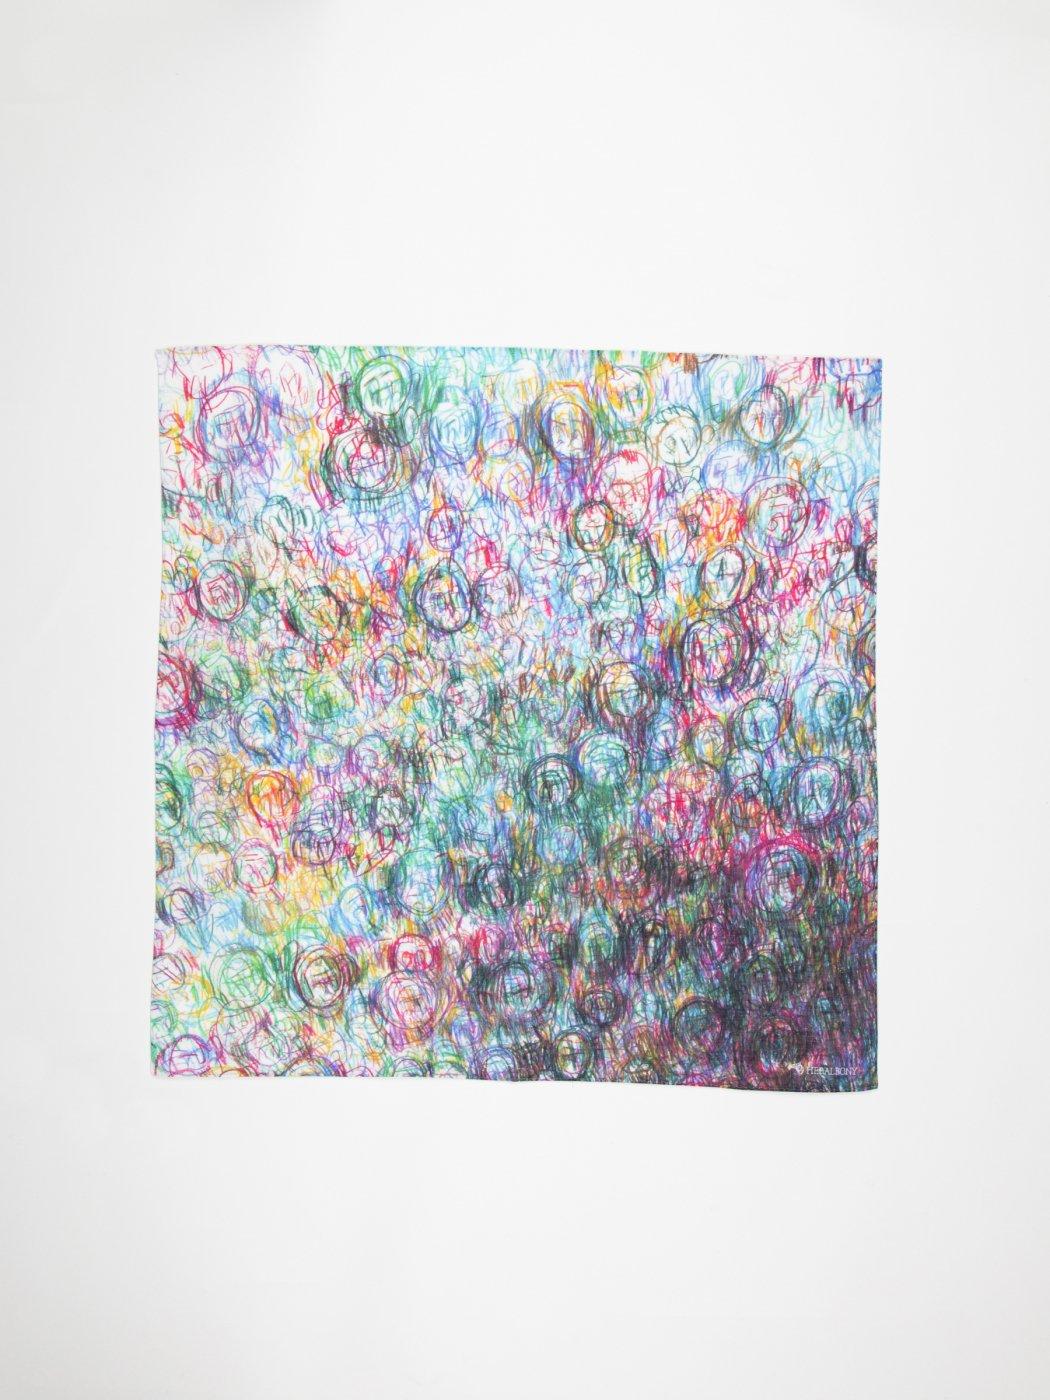 HERALBONY -ART HANDKERCHIEF- Fujiko Tomisawa  -NO TITLE-